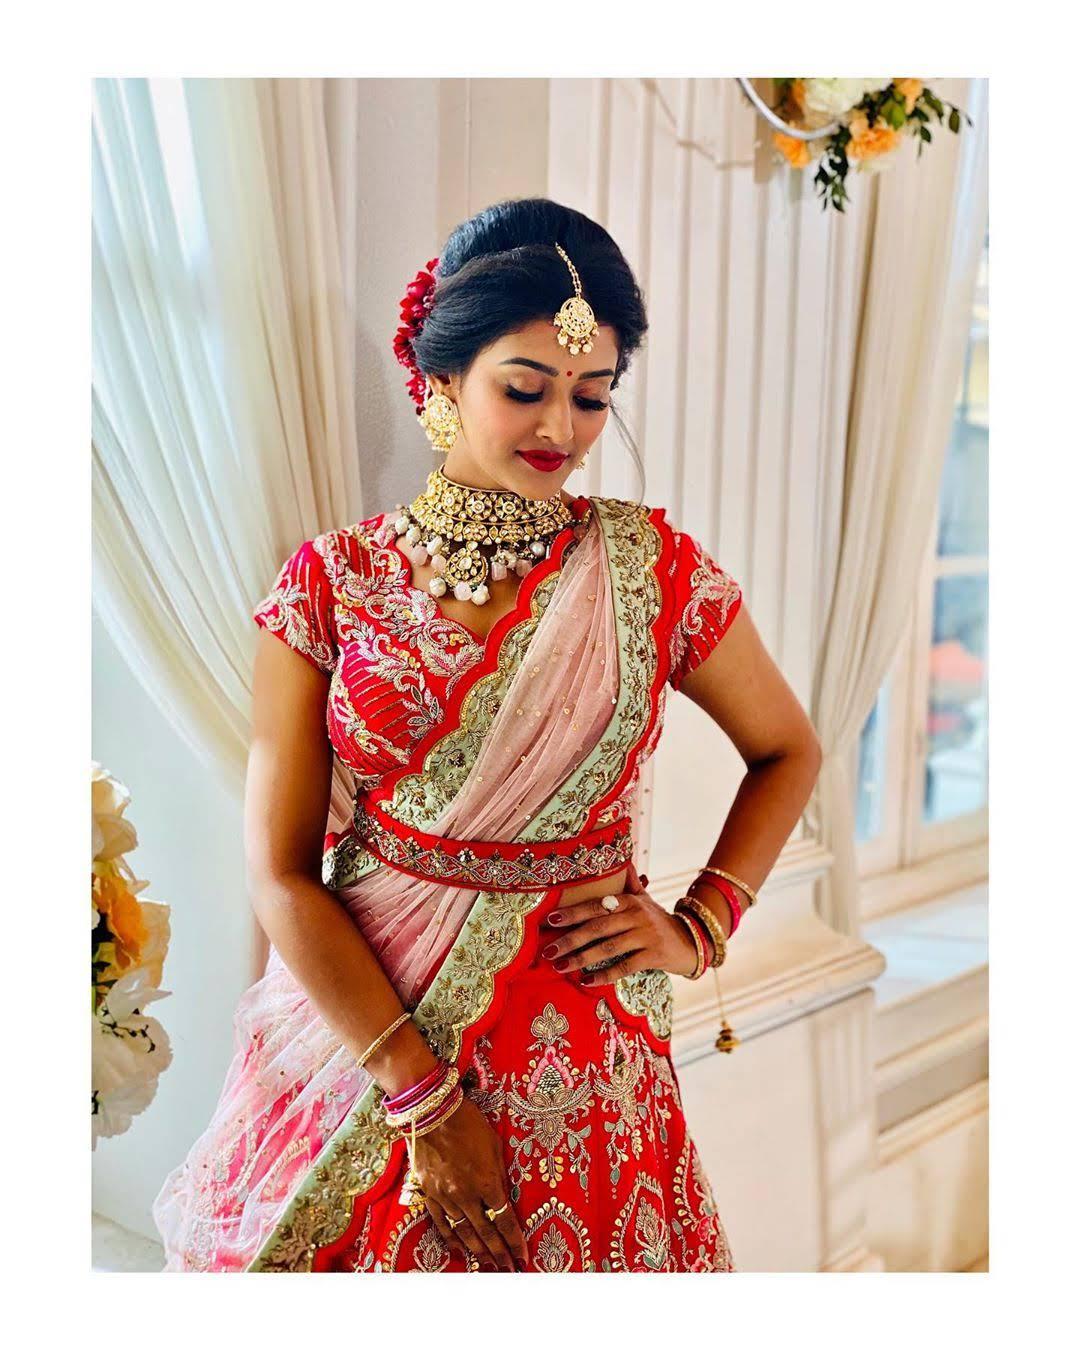 Pooja-Jhaveri-611768